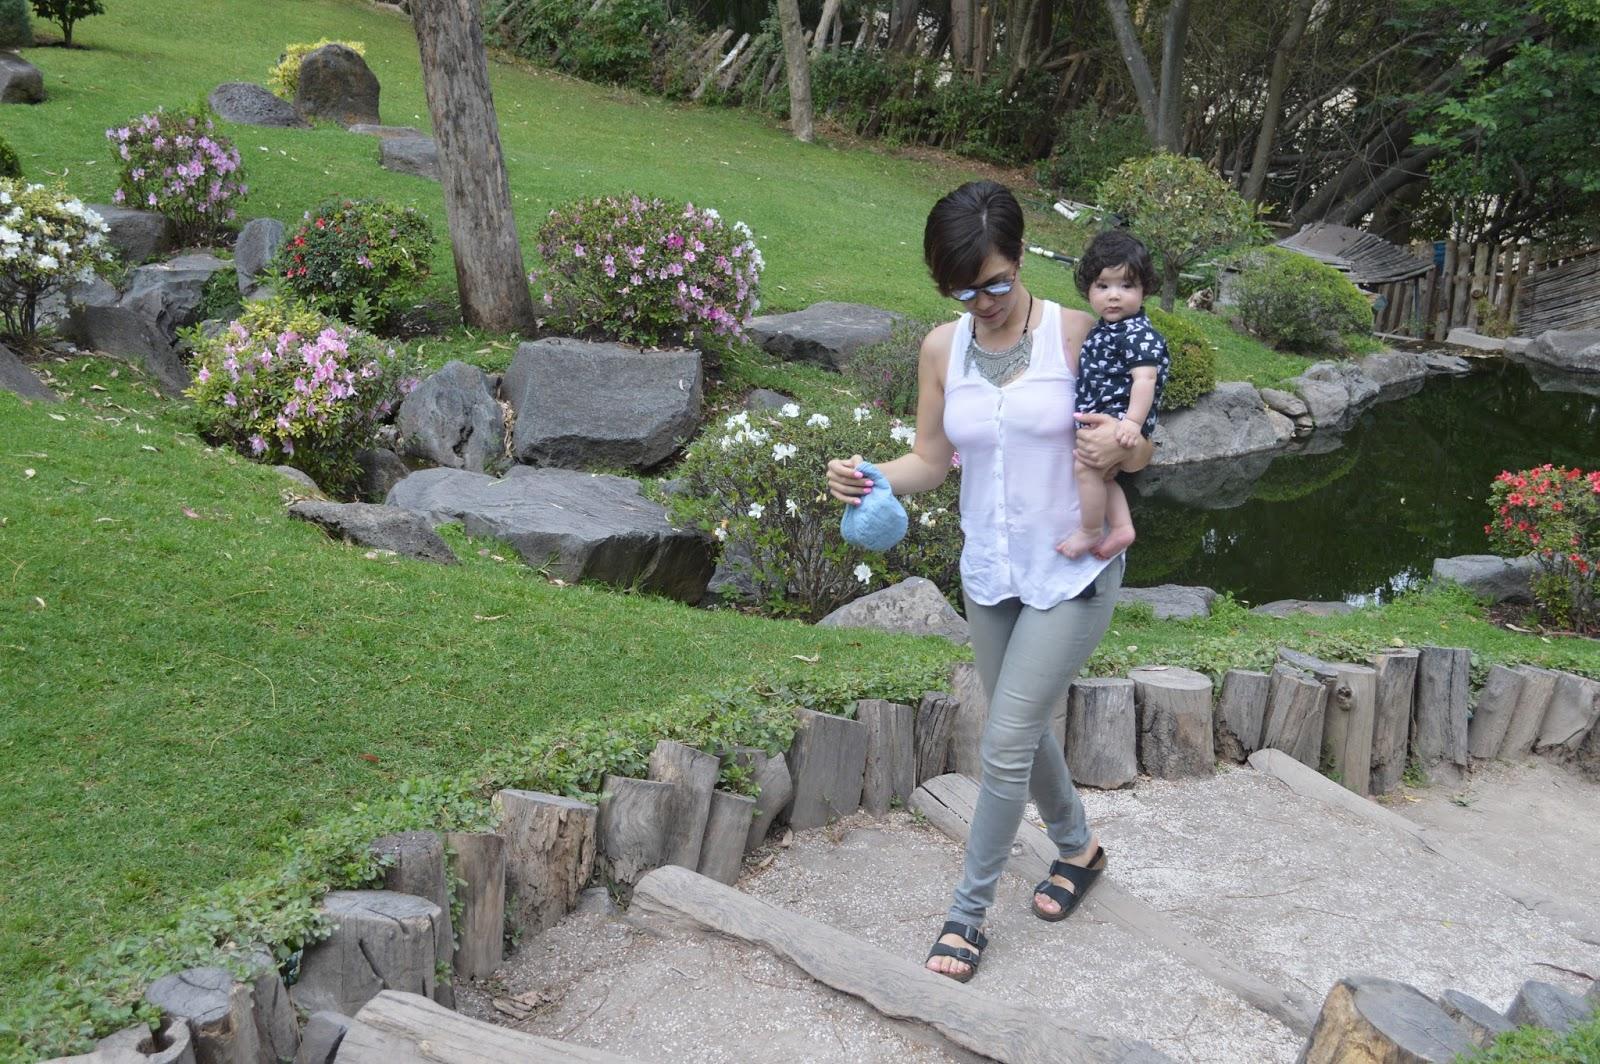 Jardin japones viva la montes for Jardin japones precio 2016